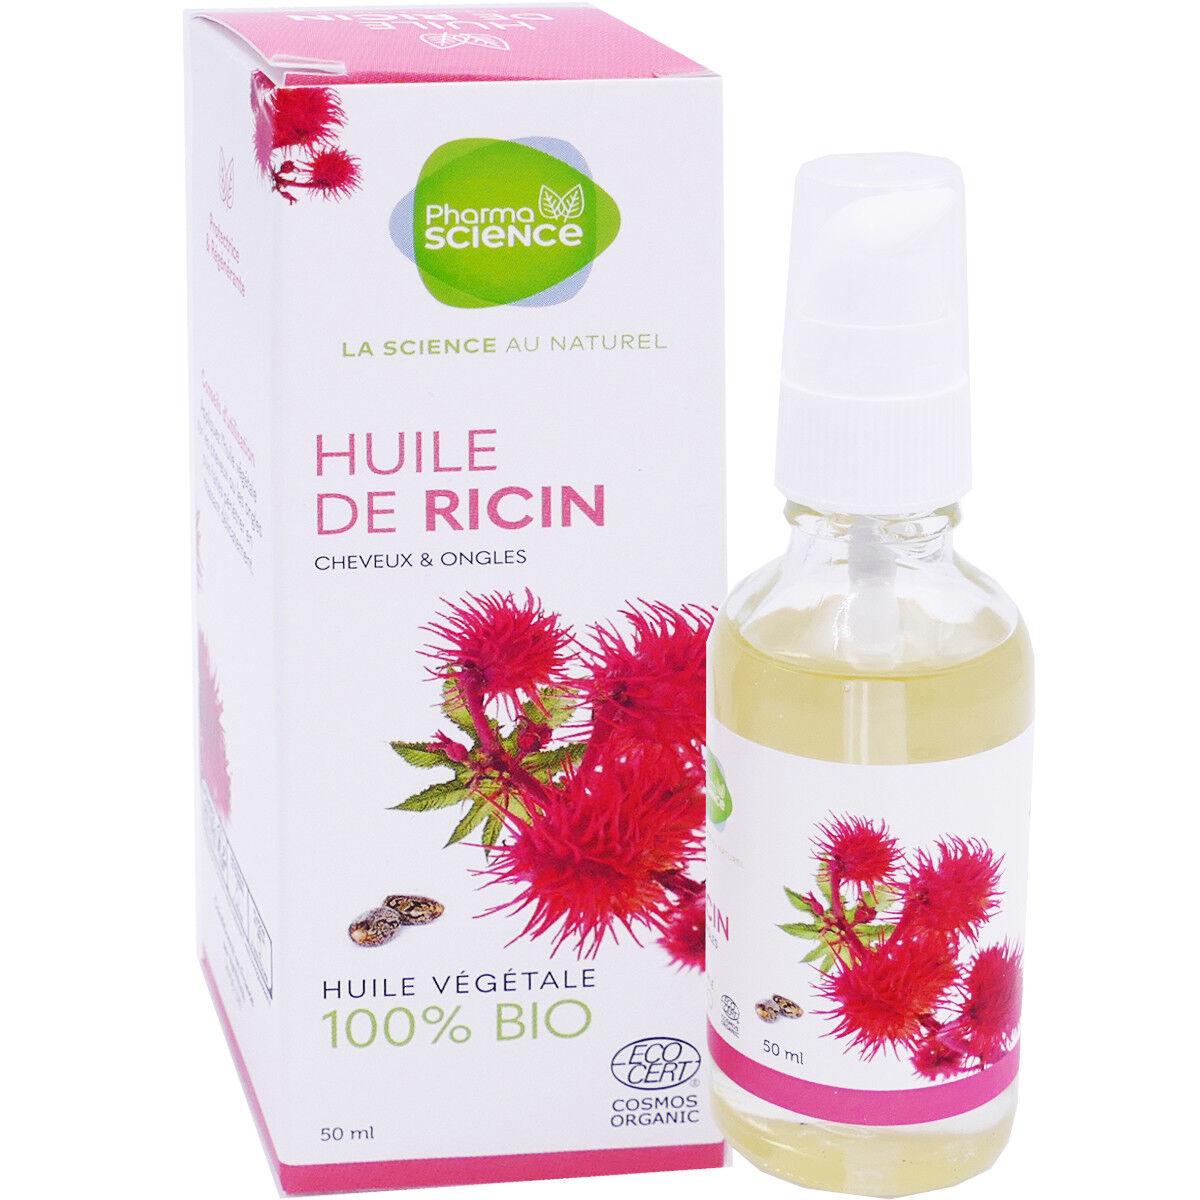 Pharmascience huile de ricin 50ml cheveux ongles